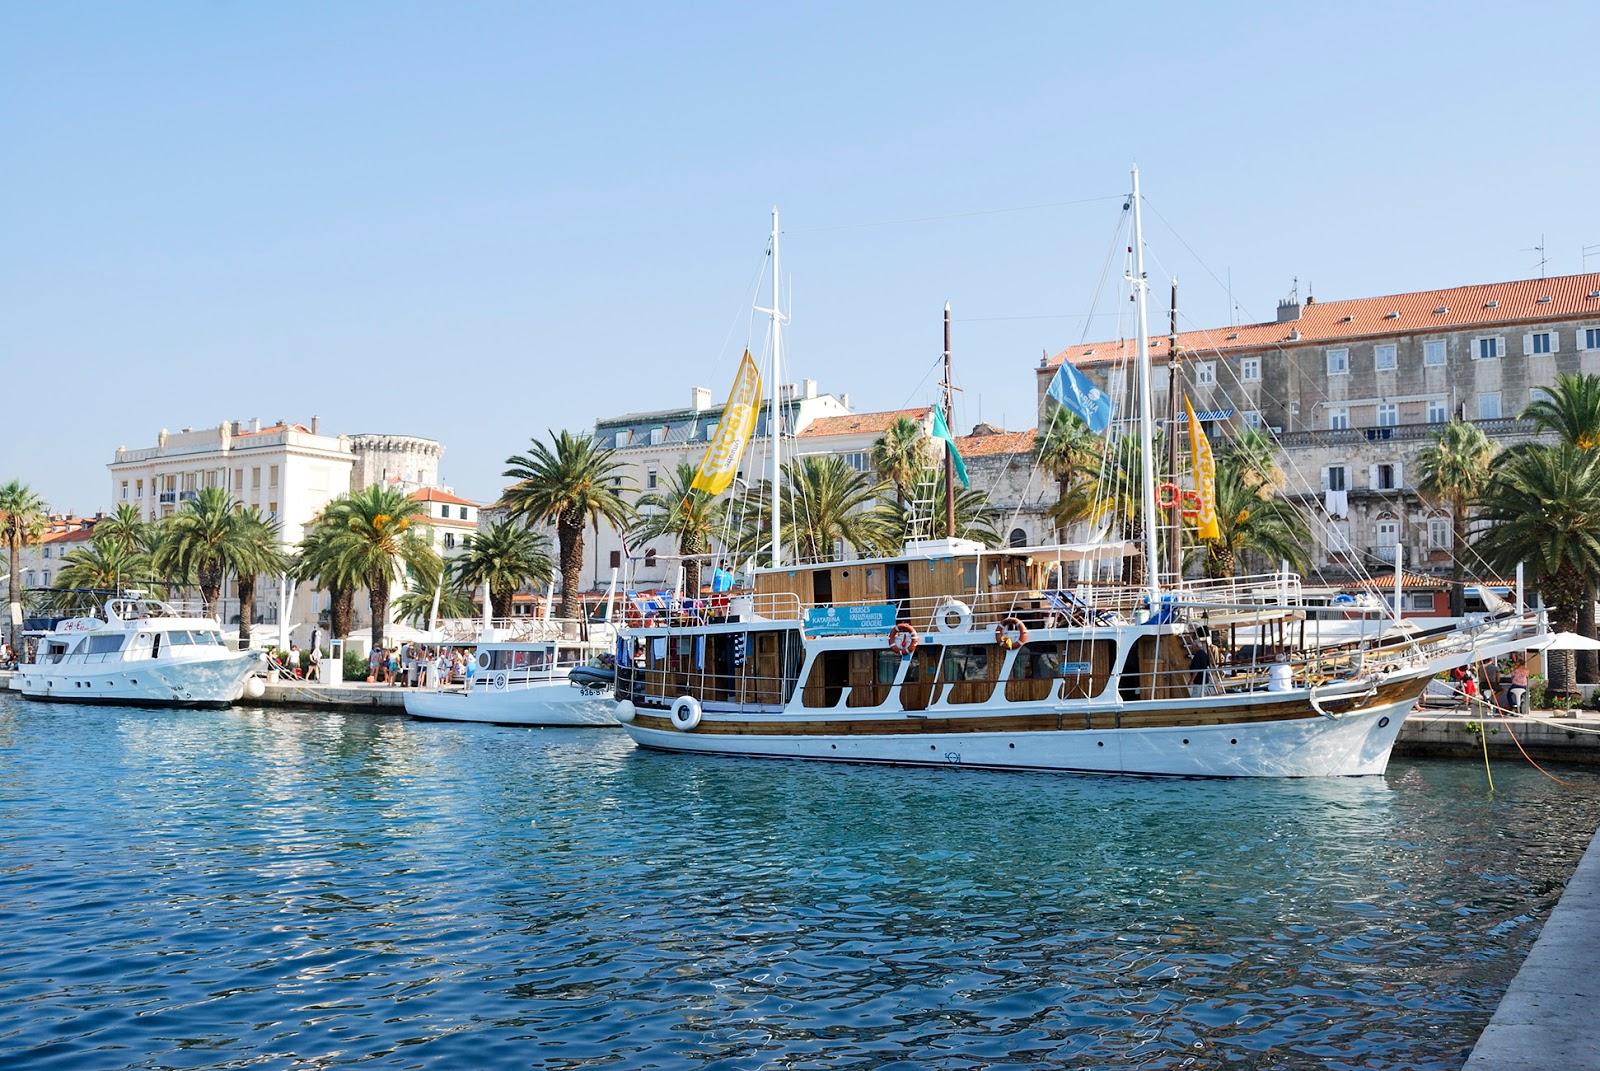 split croatia europe dalmatia adriatic cruise seafront promenade riva